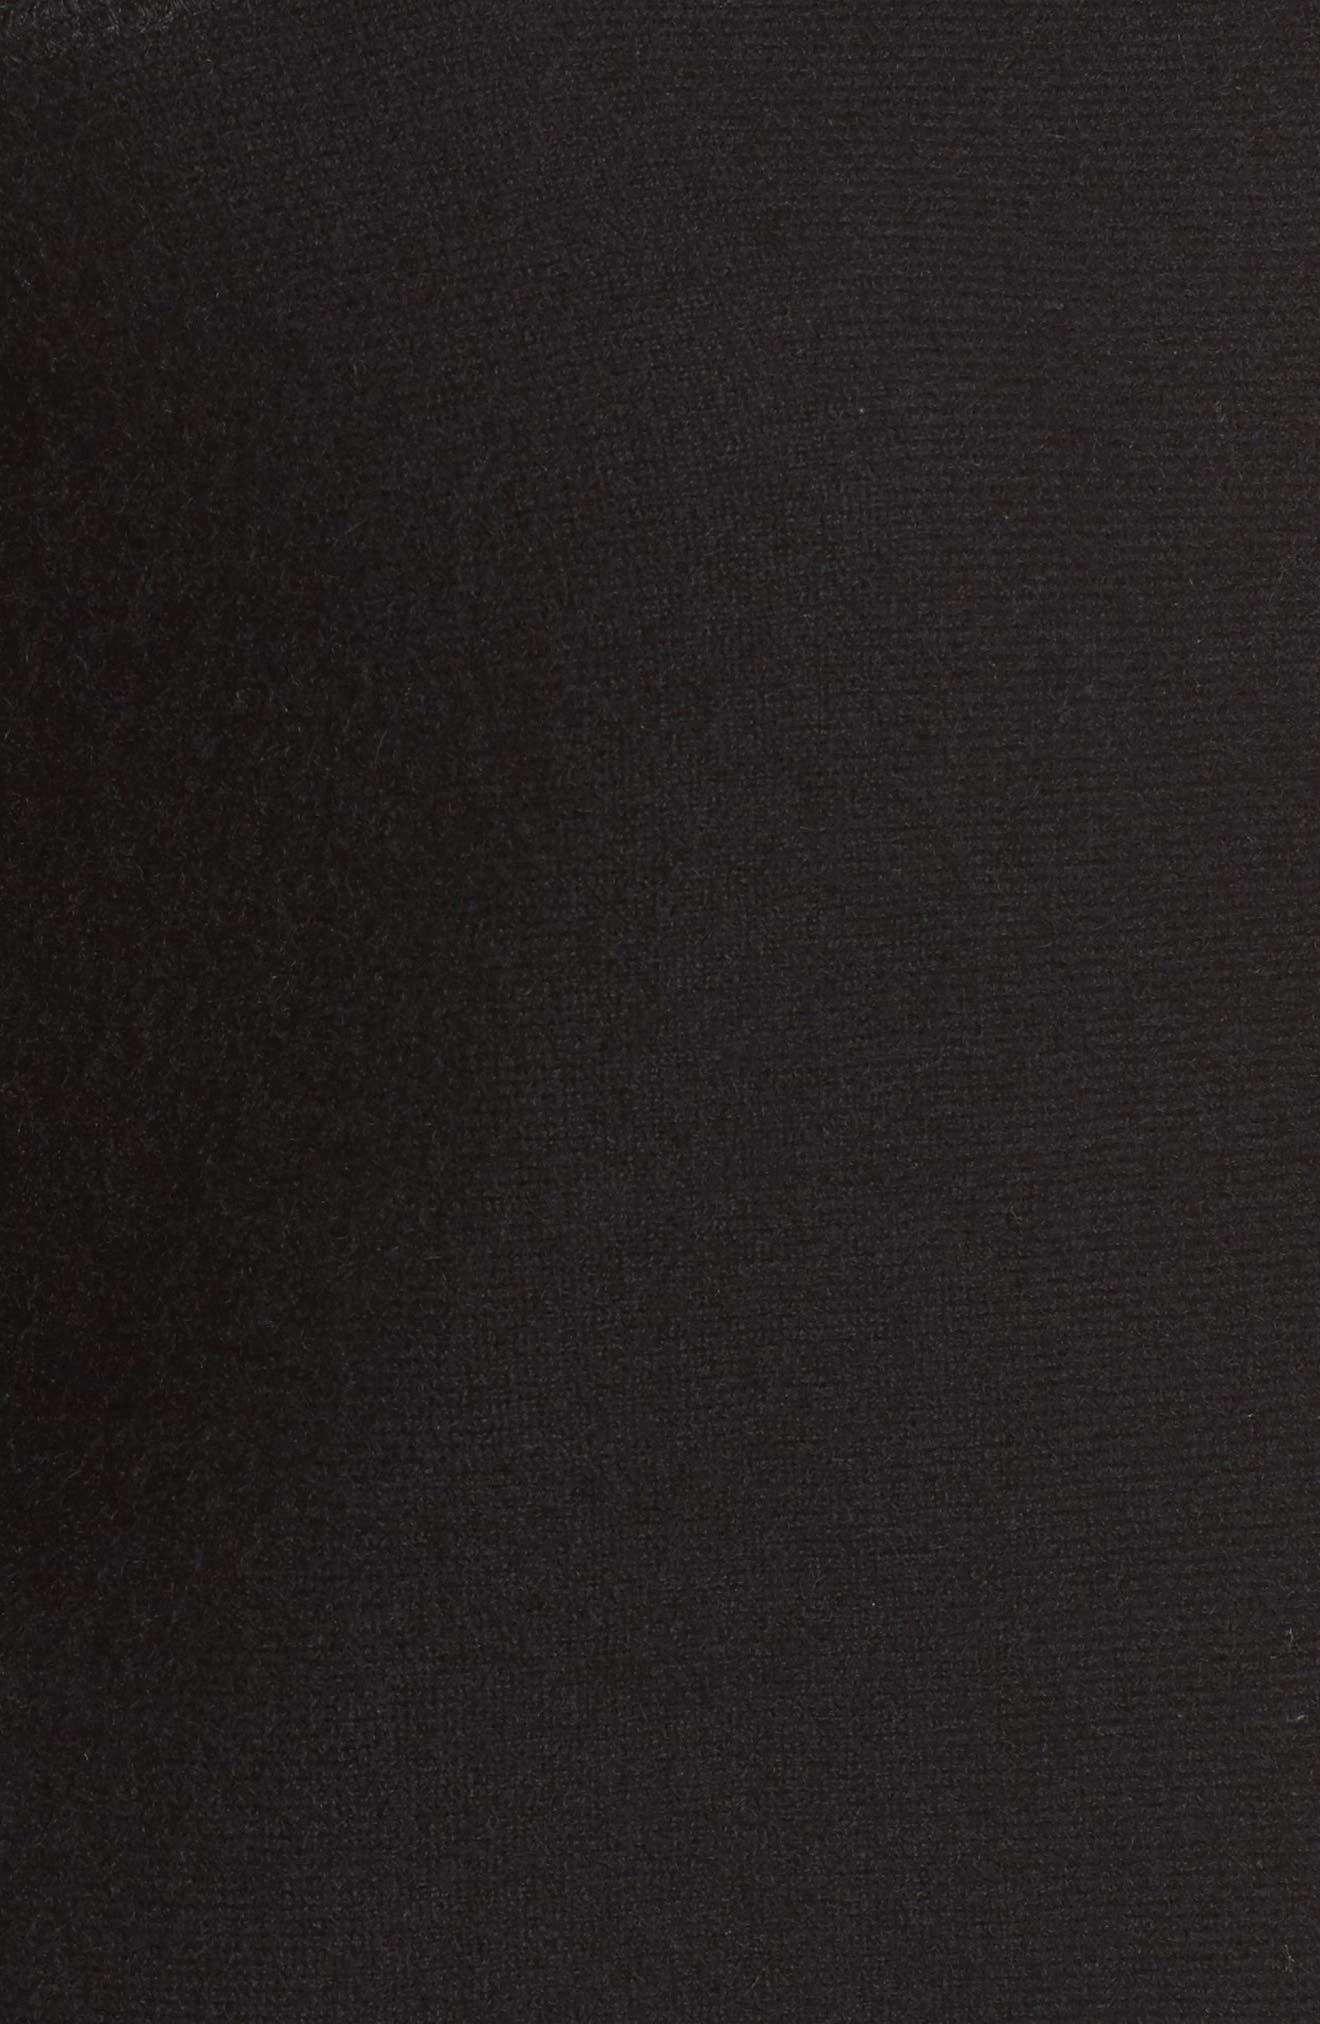 Colorblock Cashmere Sweater,                             Alternate thumbnail 5, color,                             001